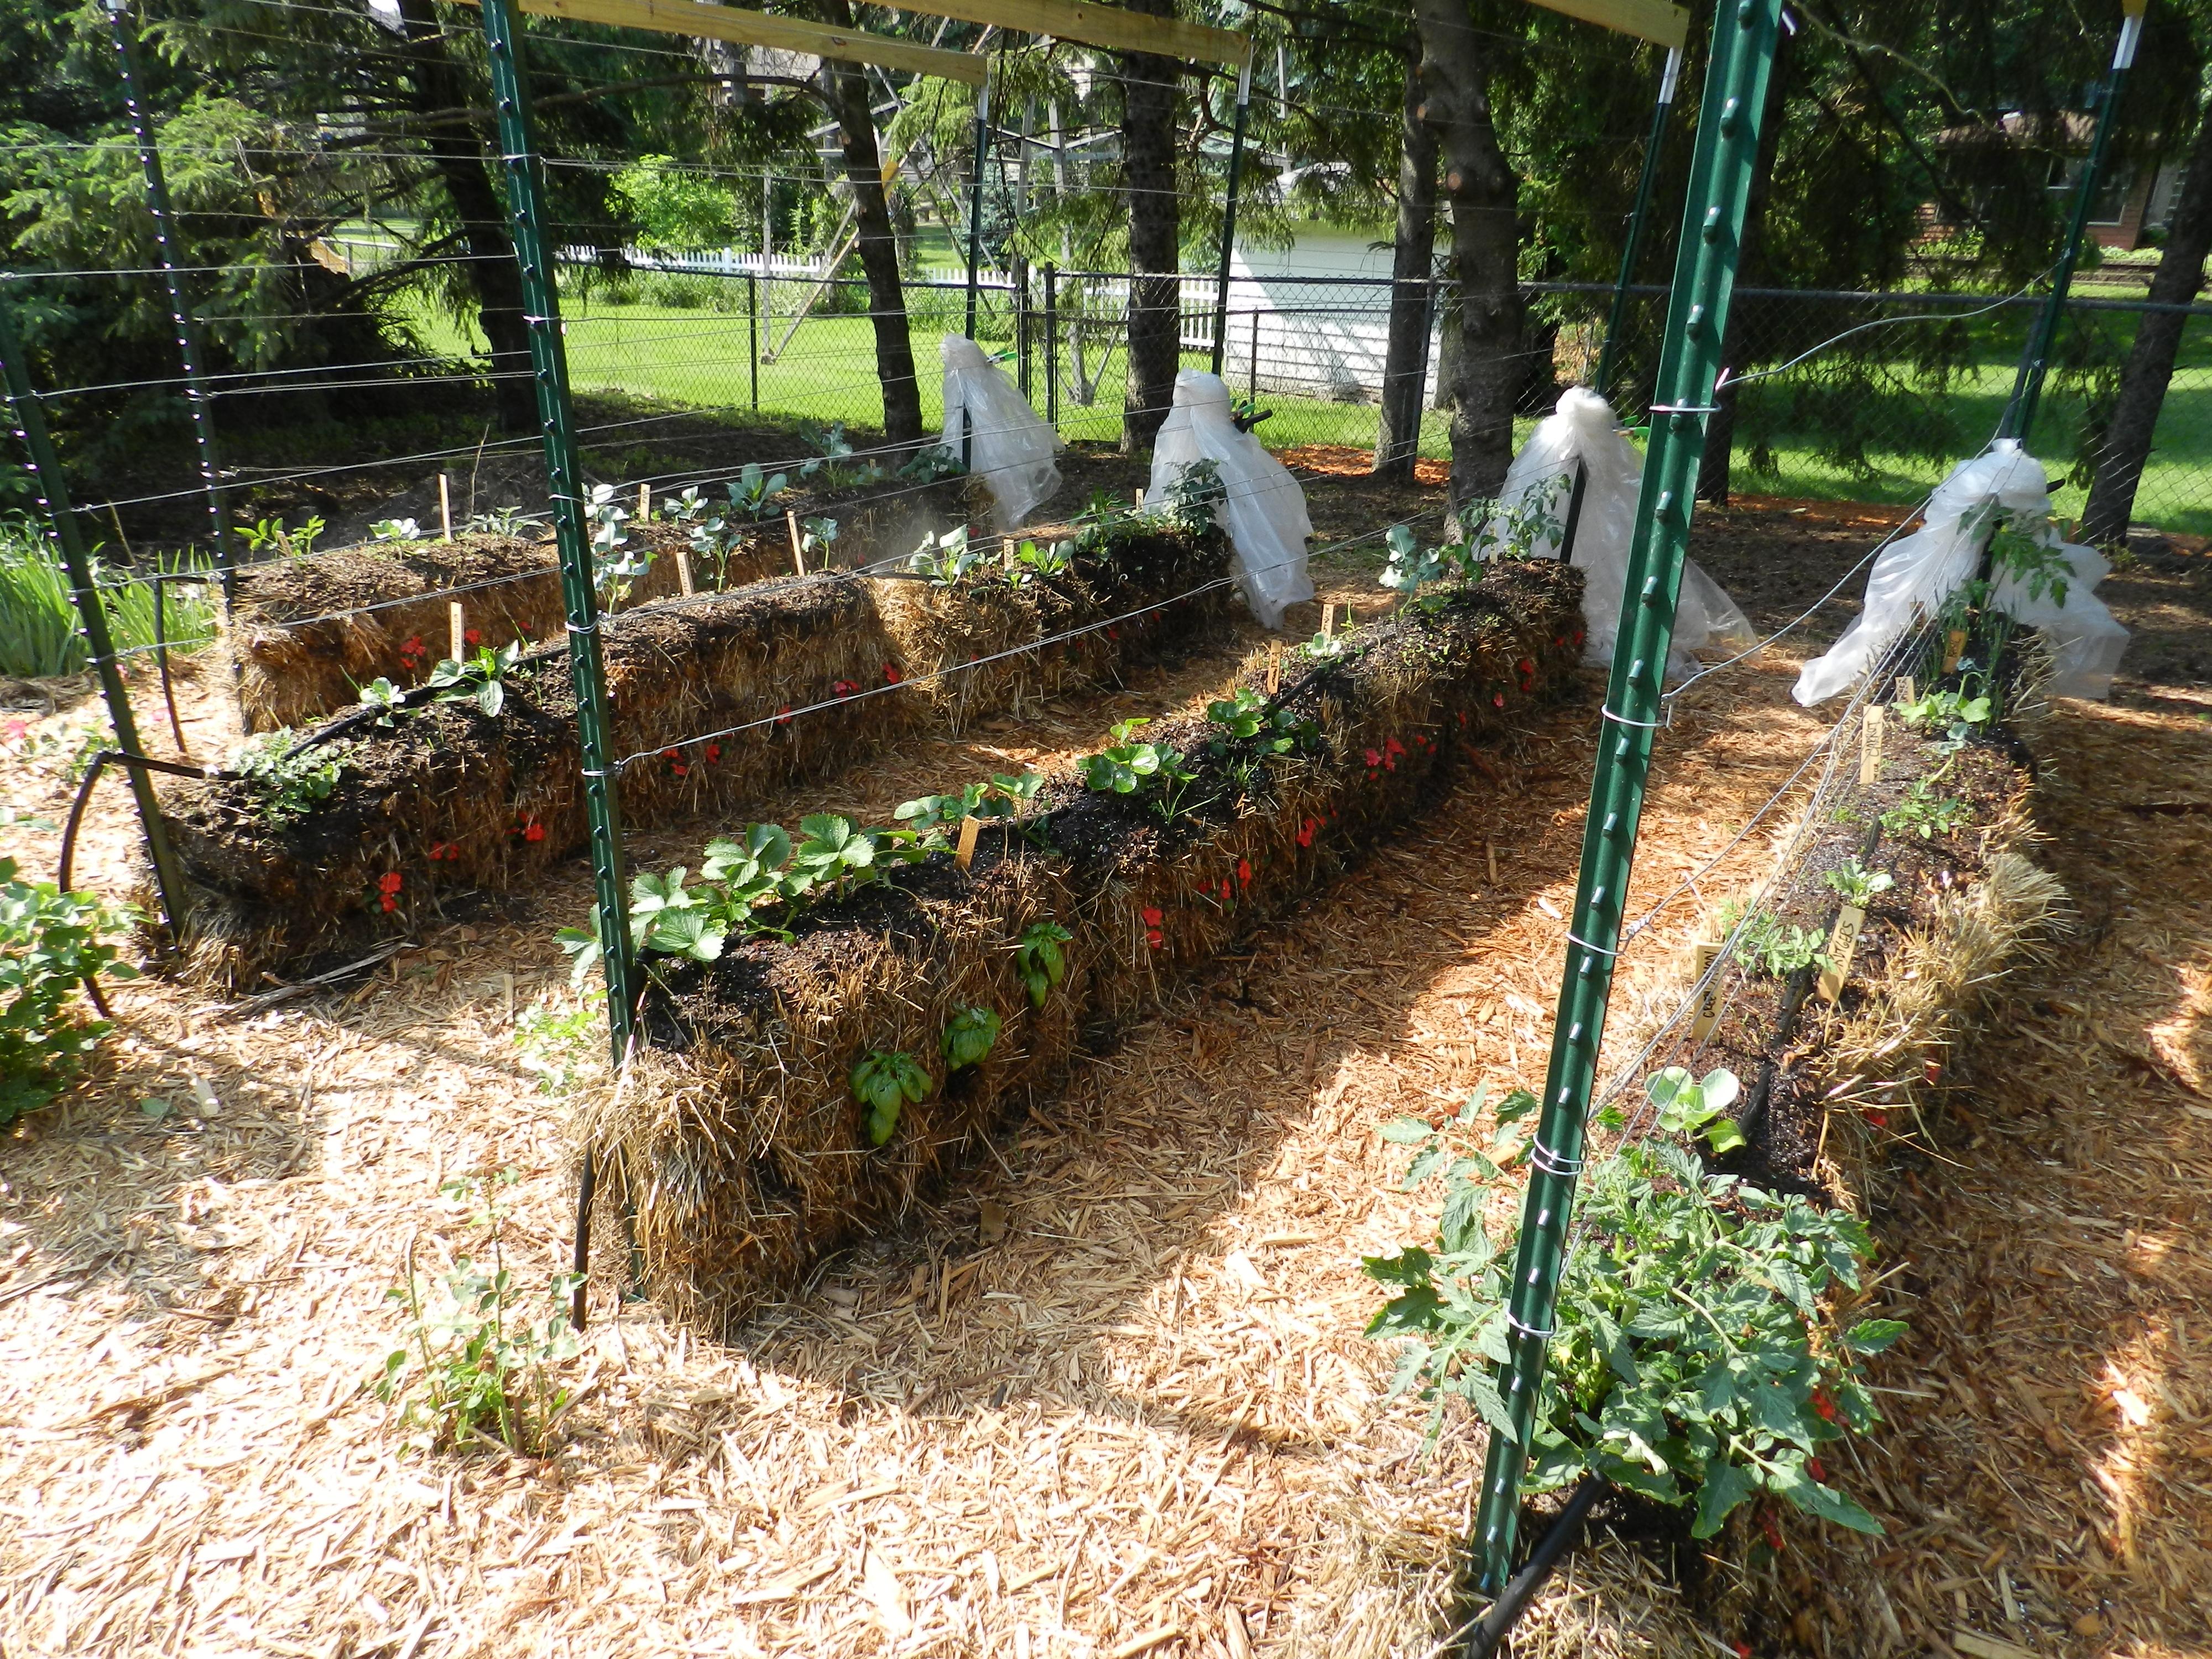 Gardening in straw garden housecalls for Backyard soil